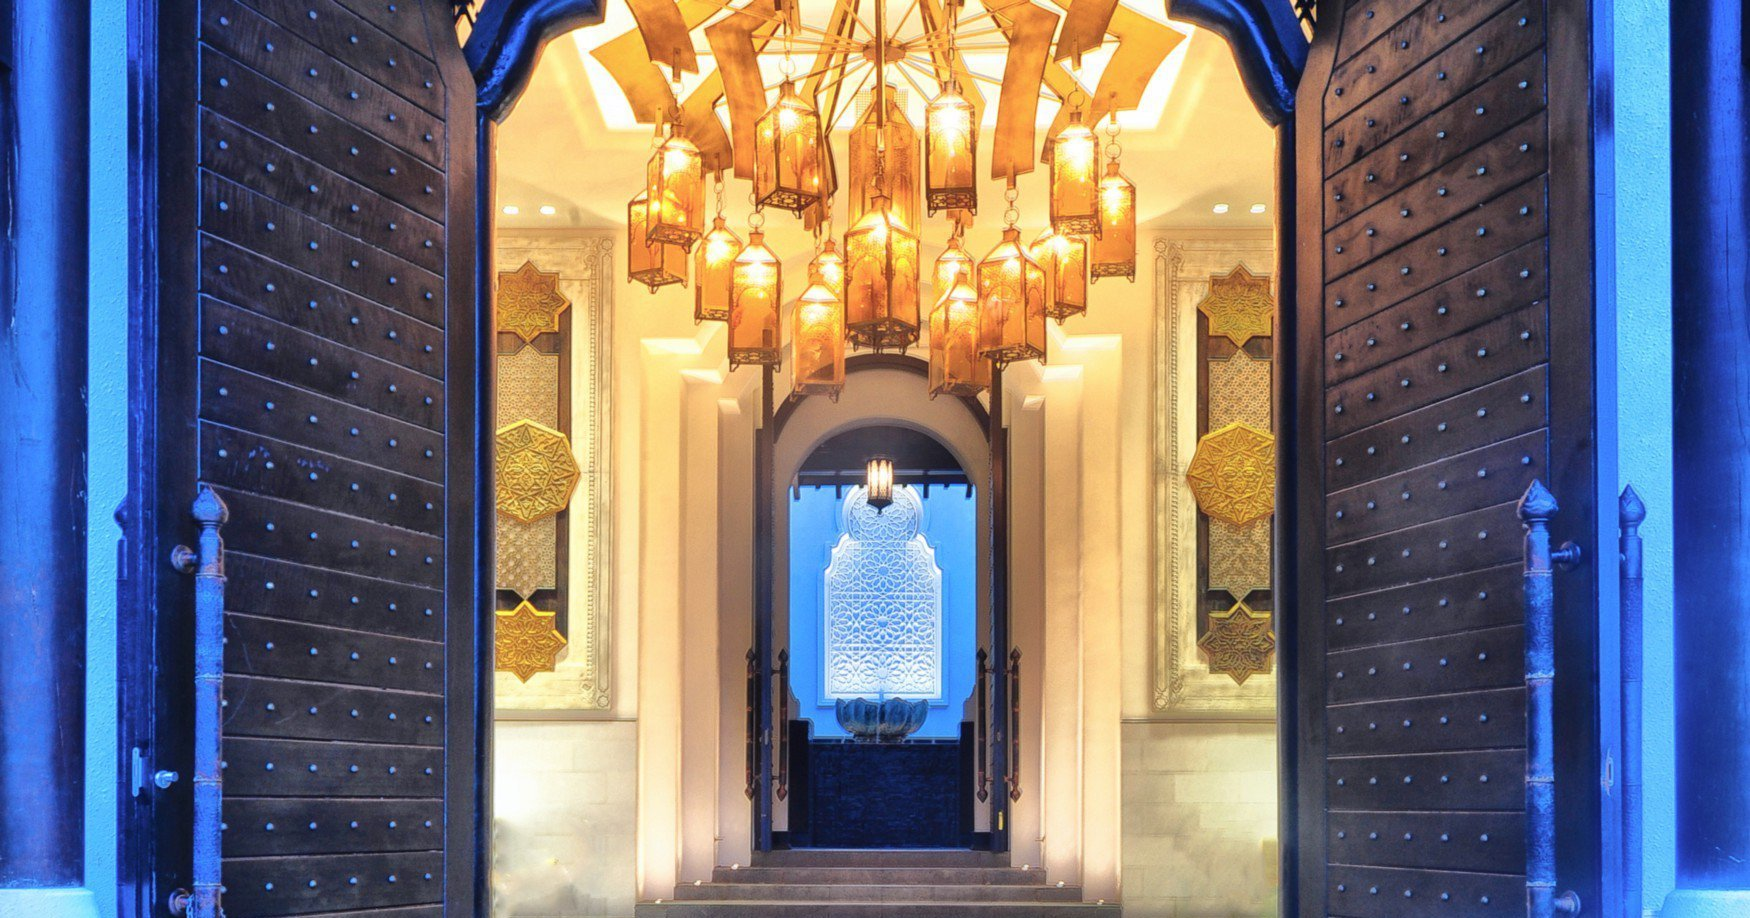 FOTO Istana 100 Bilik Sultan Terengganu Bak Fairytale